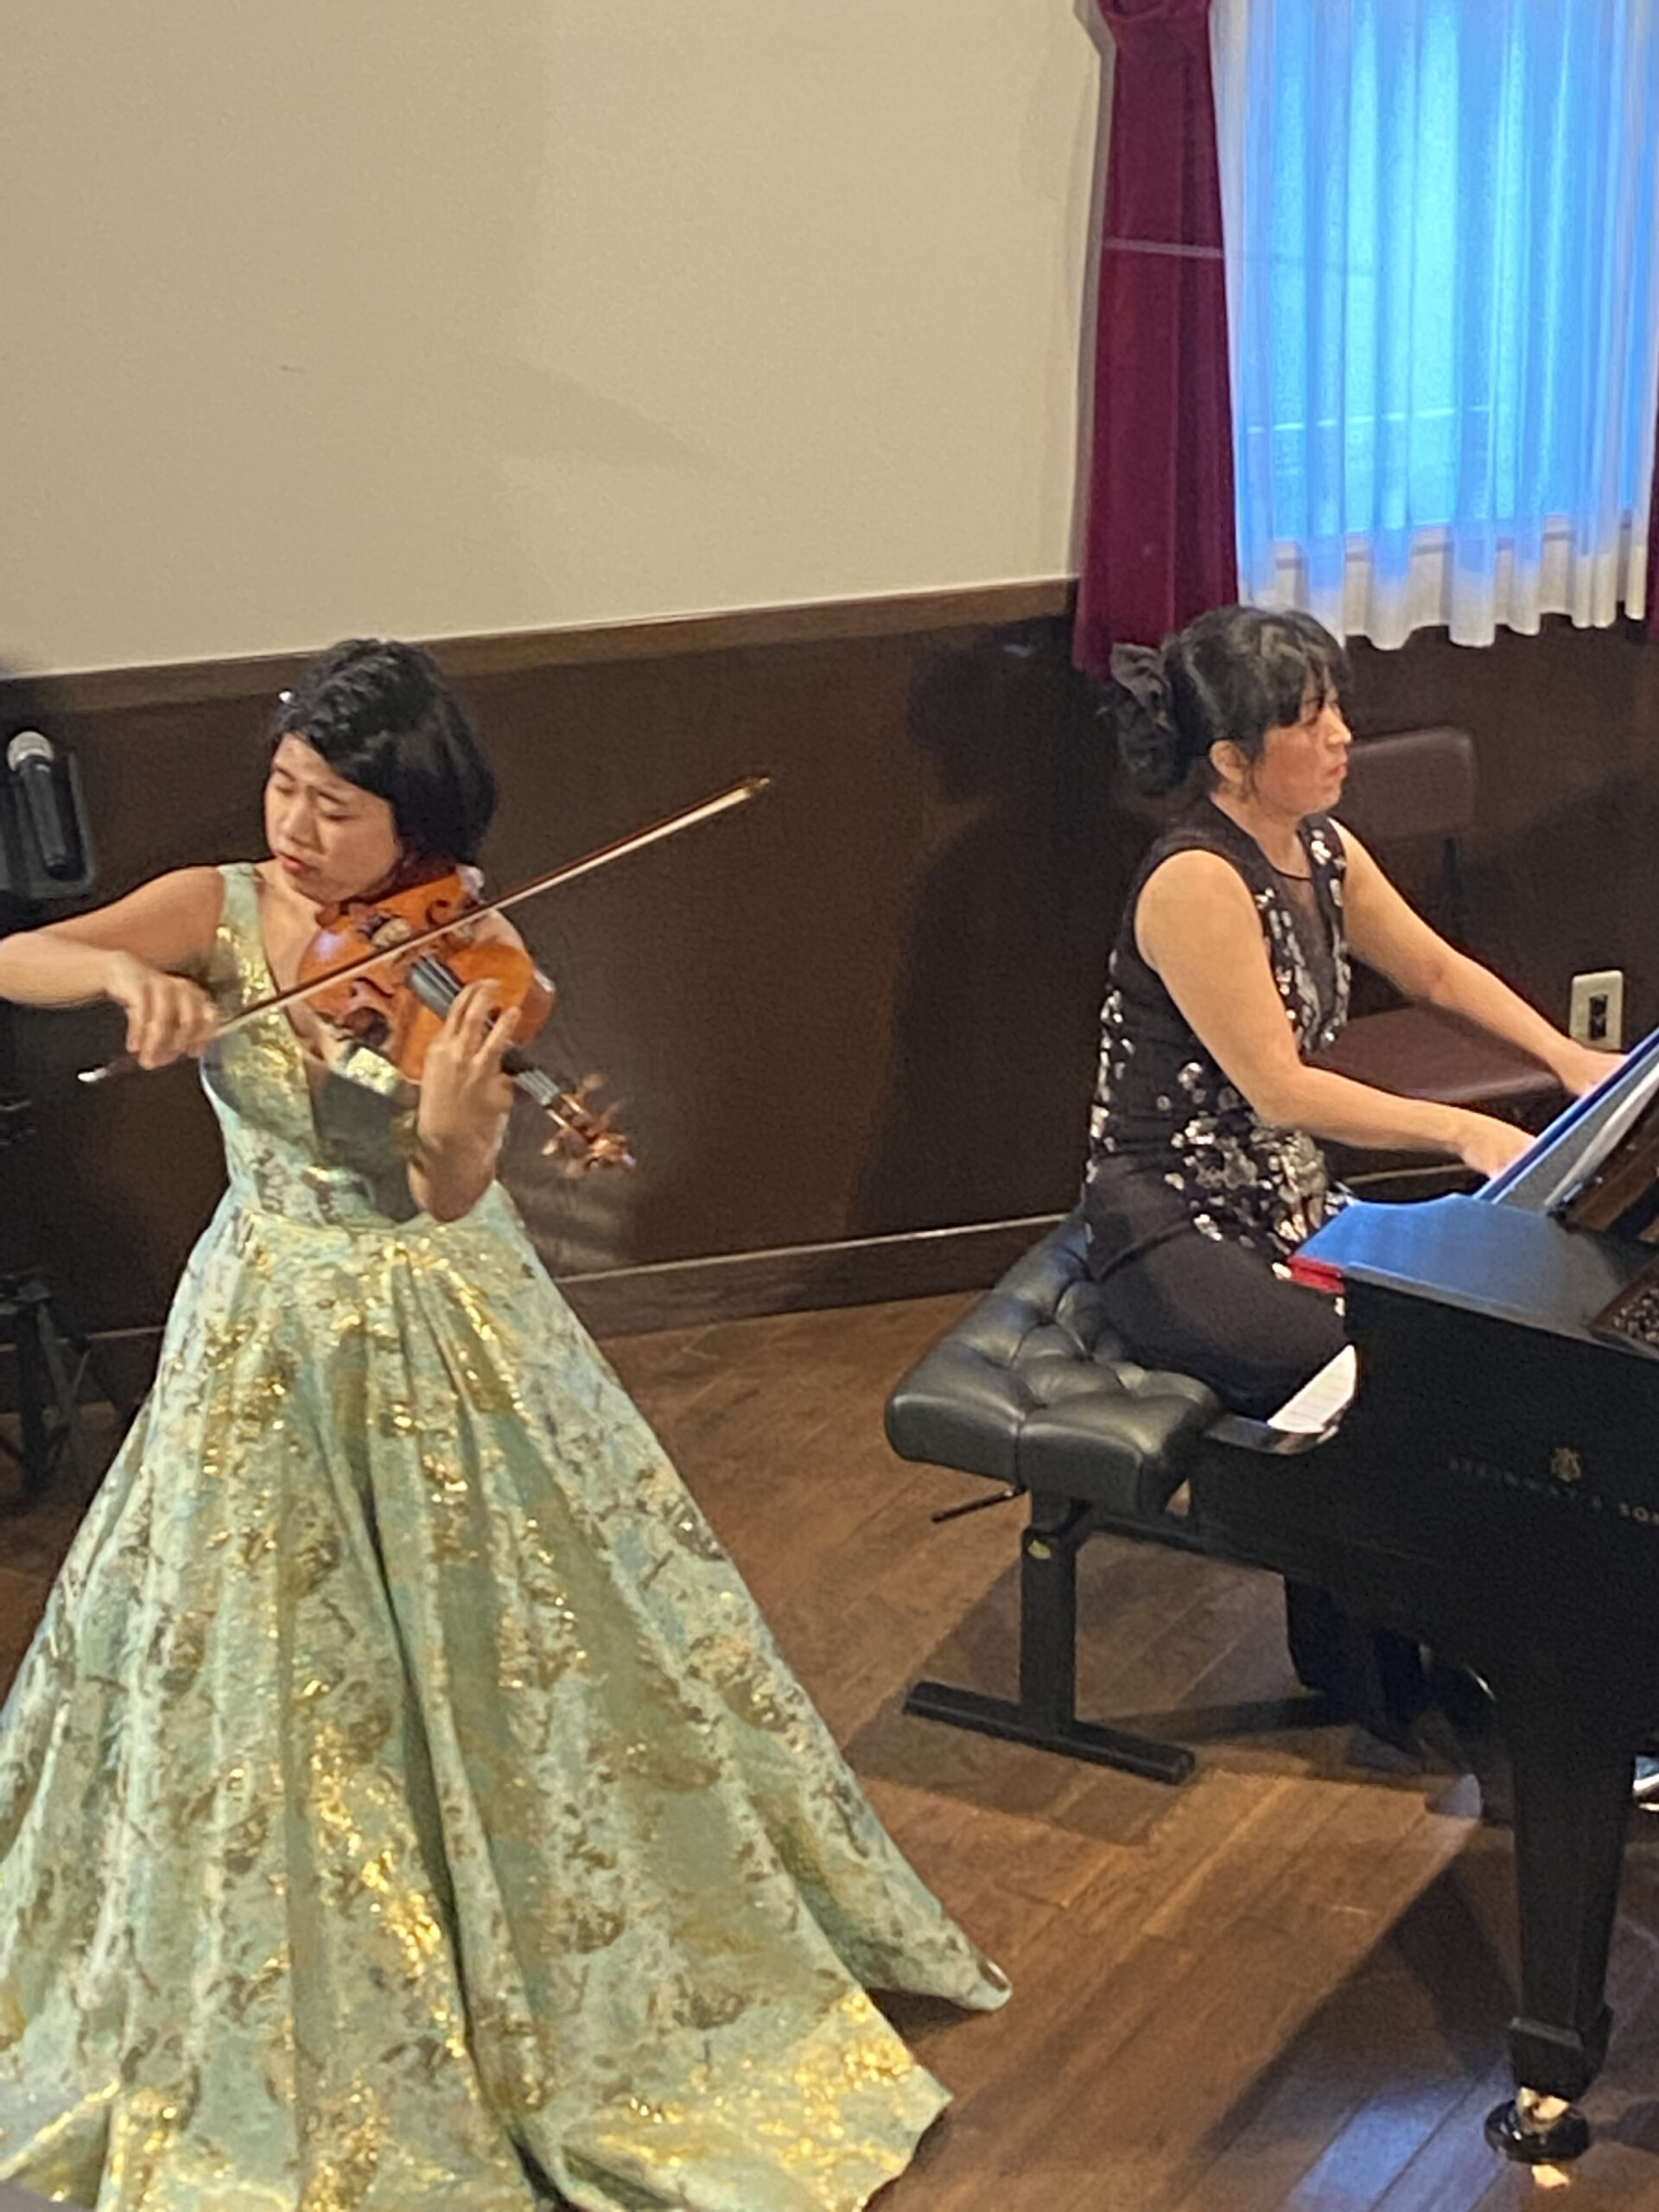 【E#231】ヴァイオリンのリサイタルとヴィーガン対応の店へ〜音楽とヴィーガンの食事で癒された